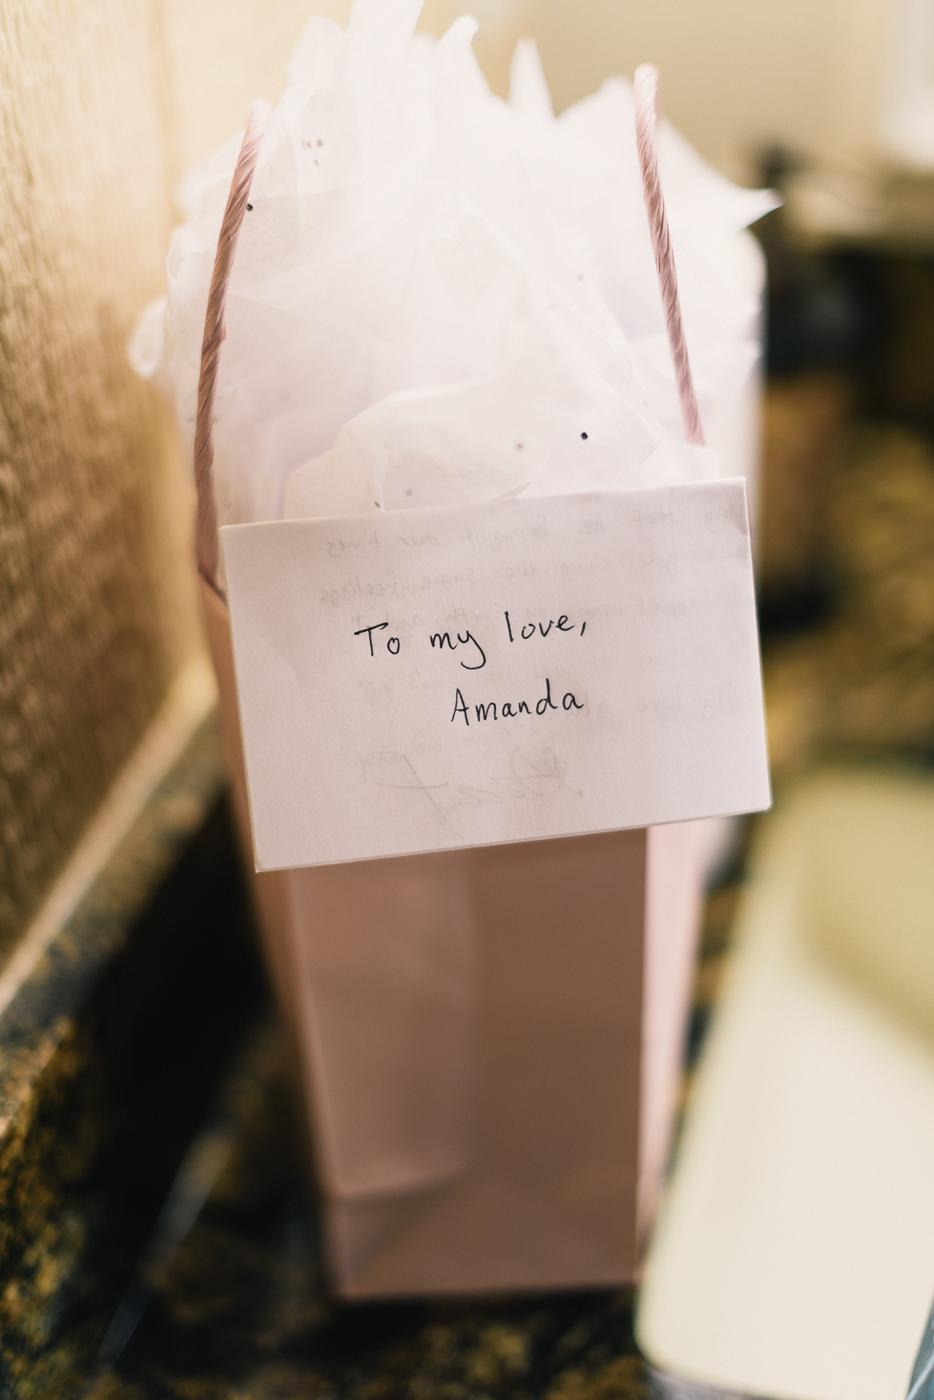 Wedding gifts to my love Amanda perfume brown bag tissue paper